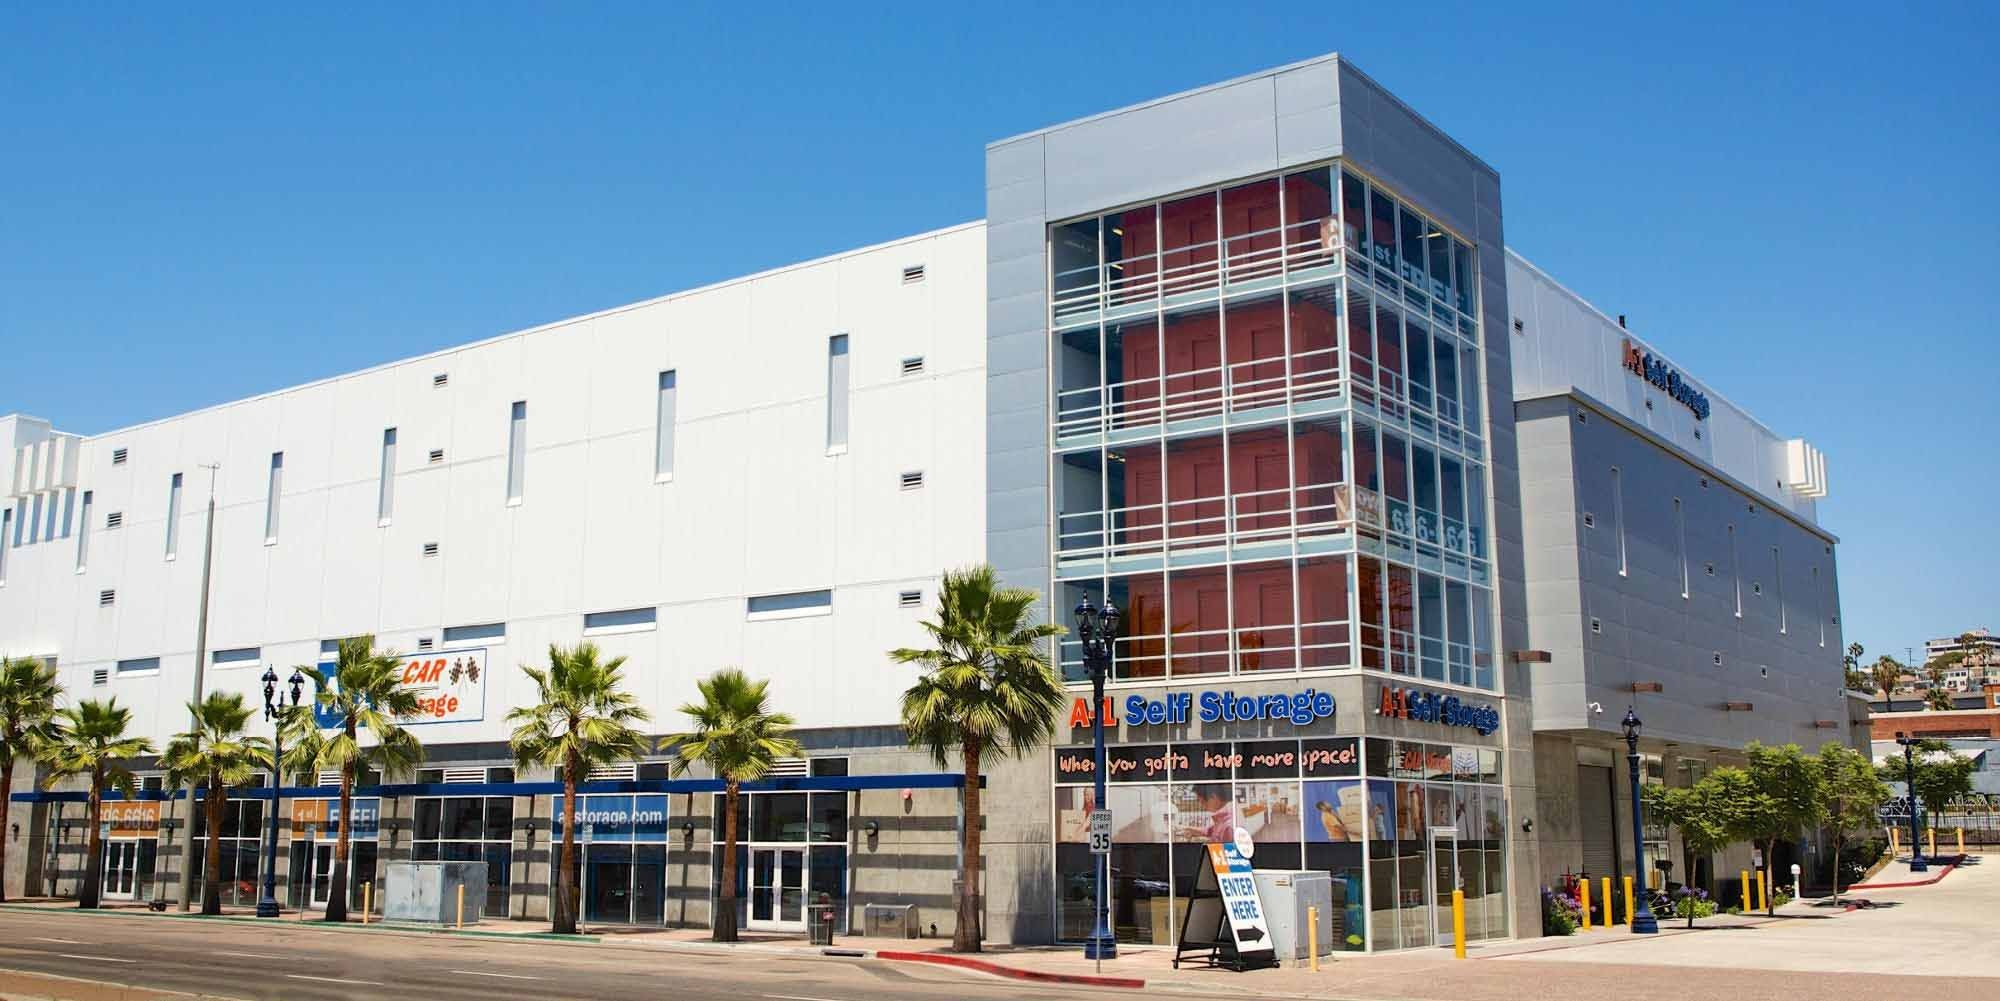 Learn about A-1 Self Storage San Diego